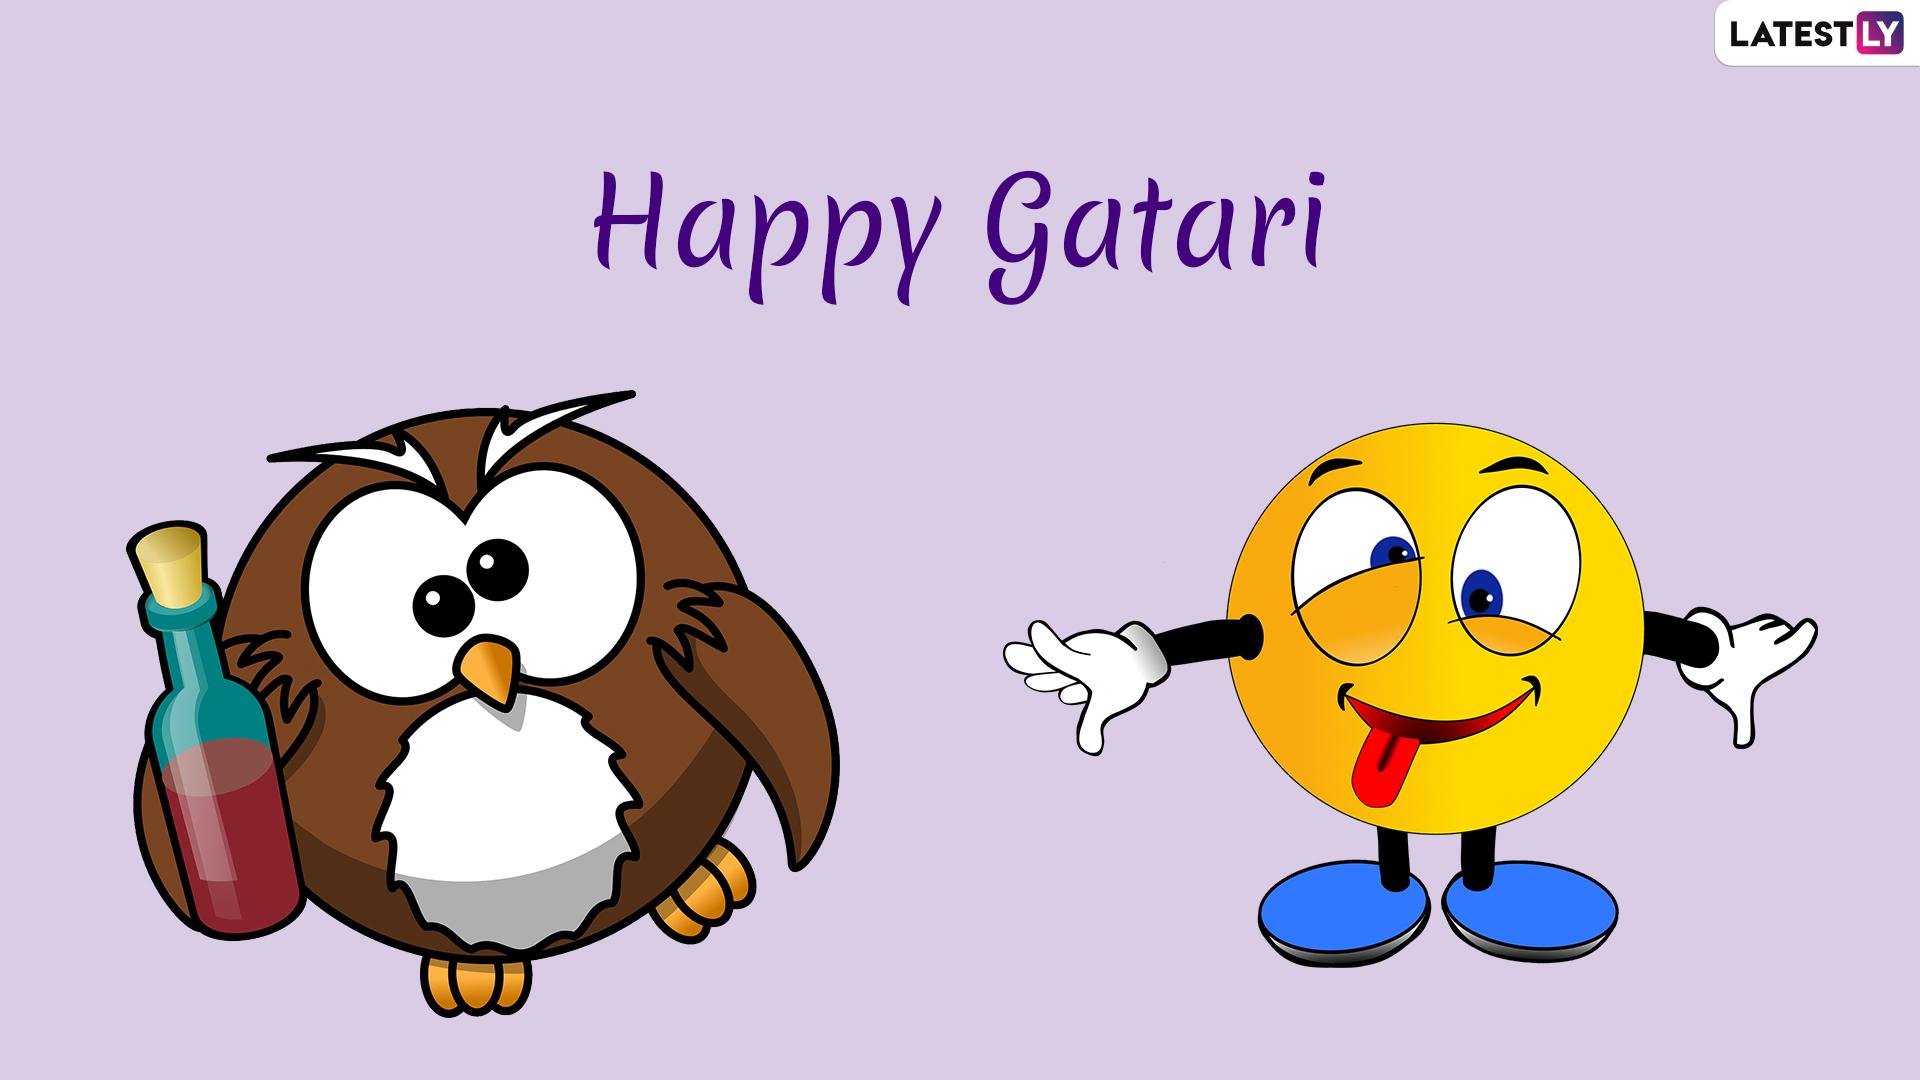 Gatari 2019 Funny Memes and Messages: Marathi WhatsApp Jokes